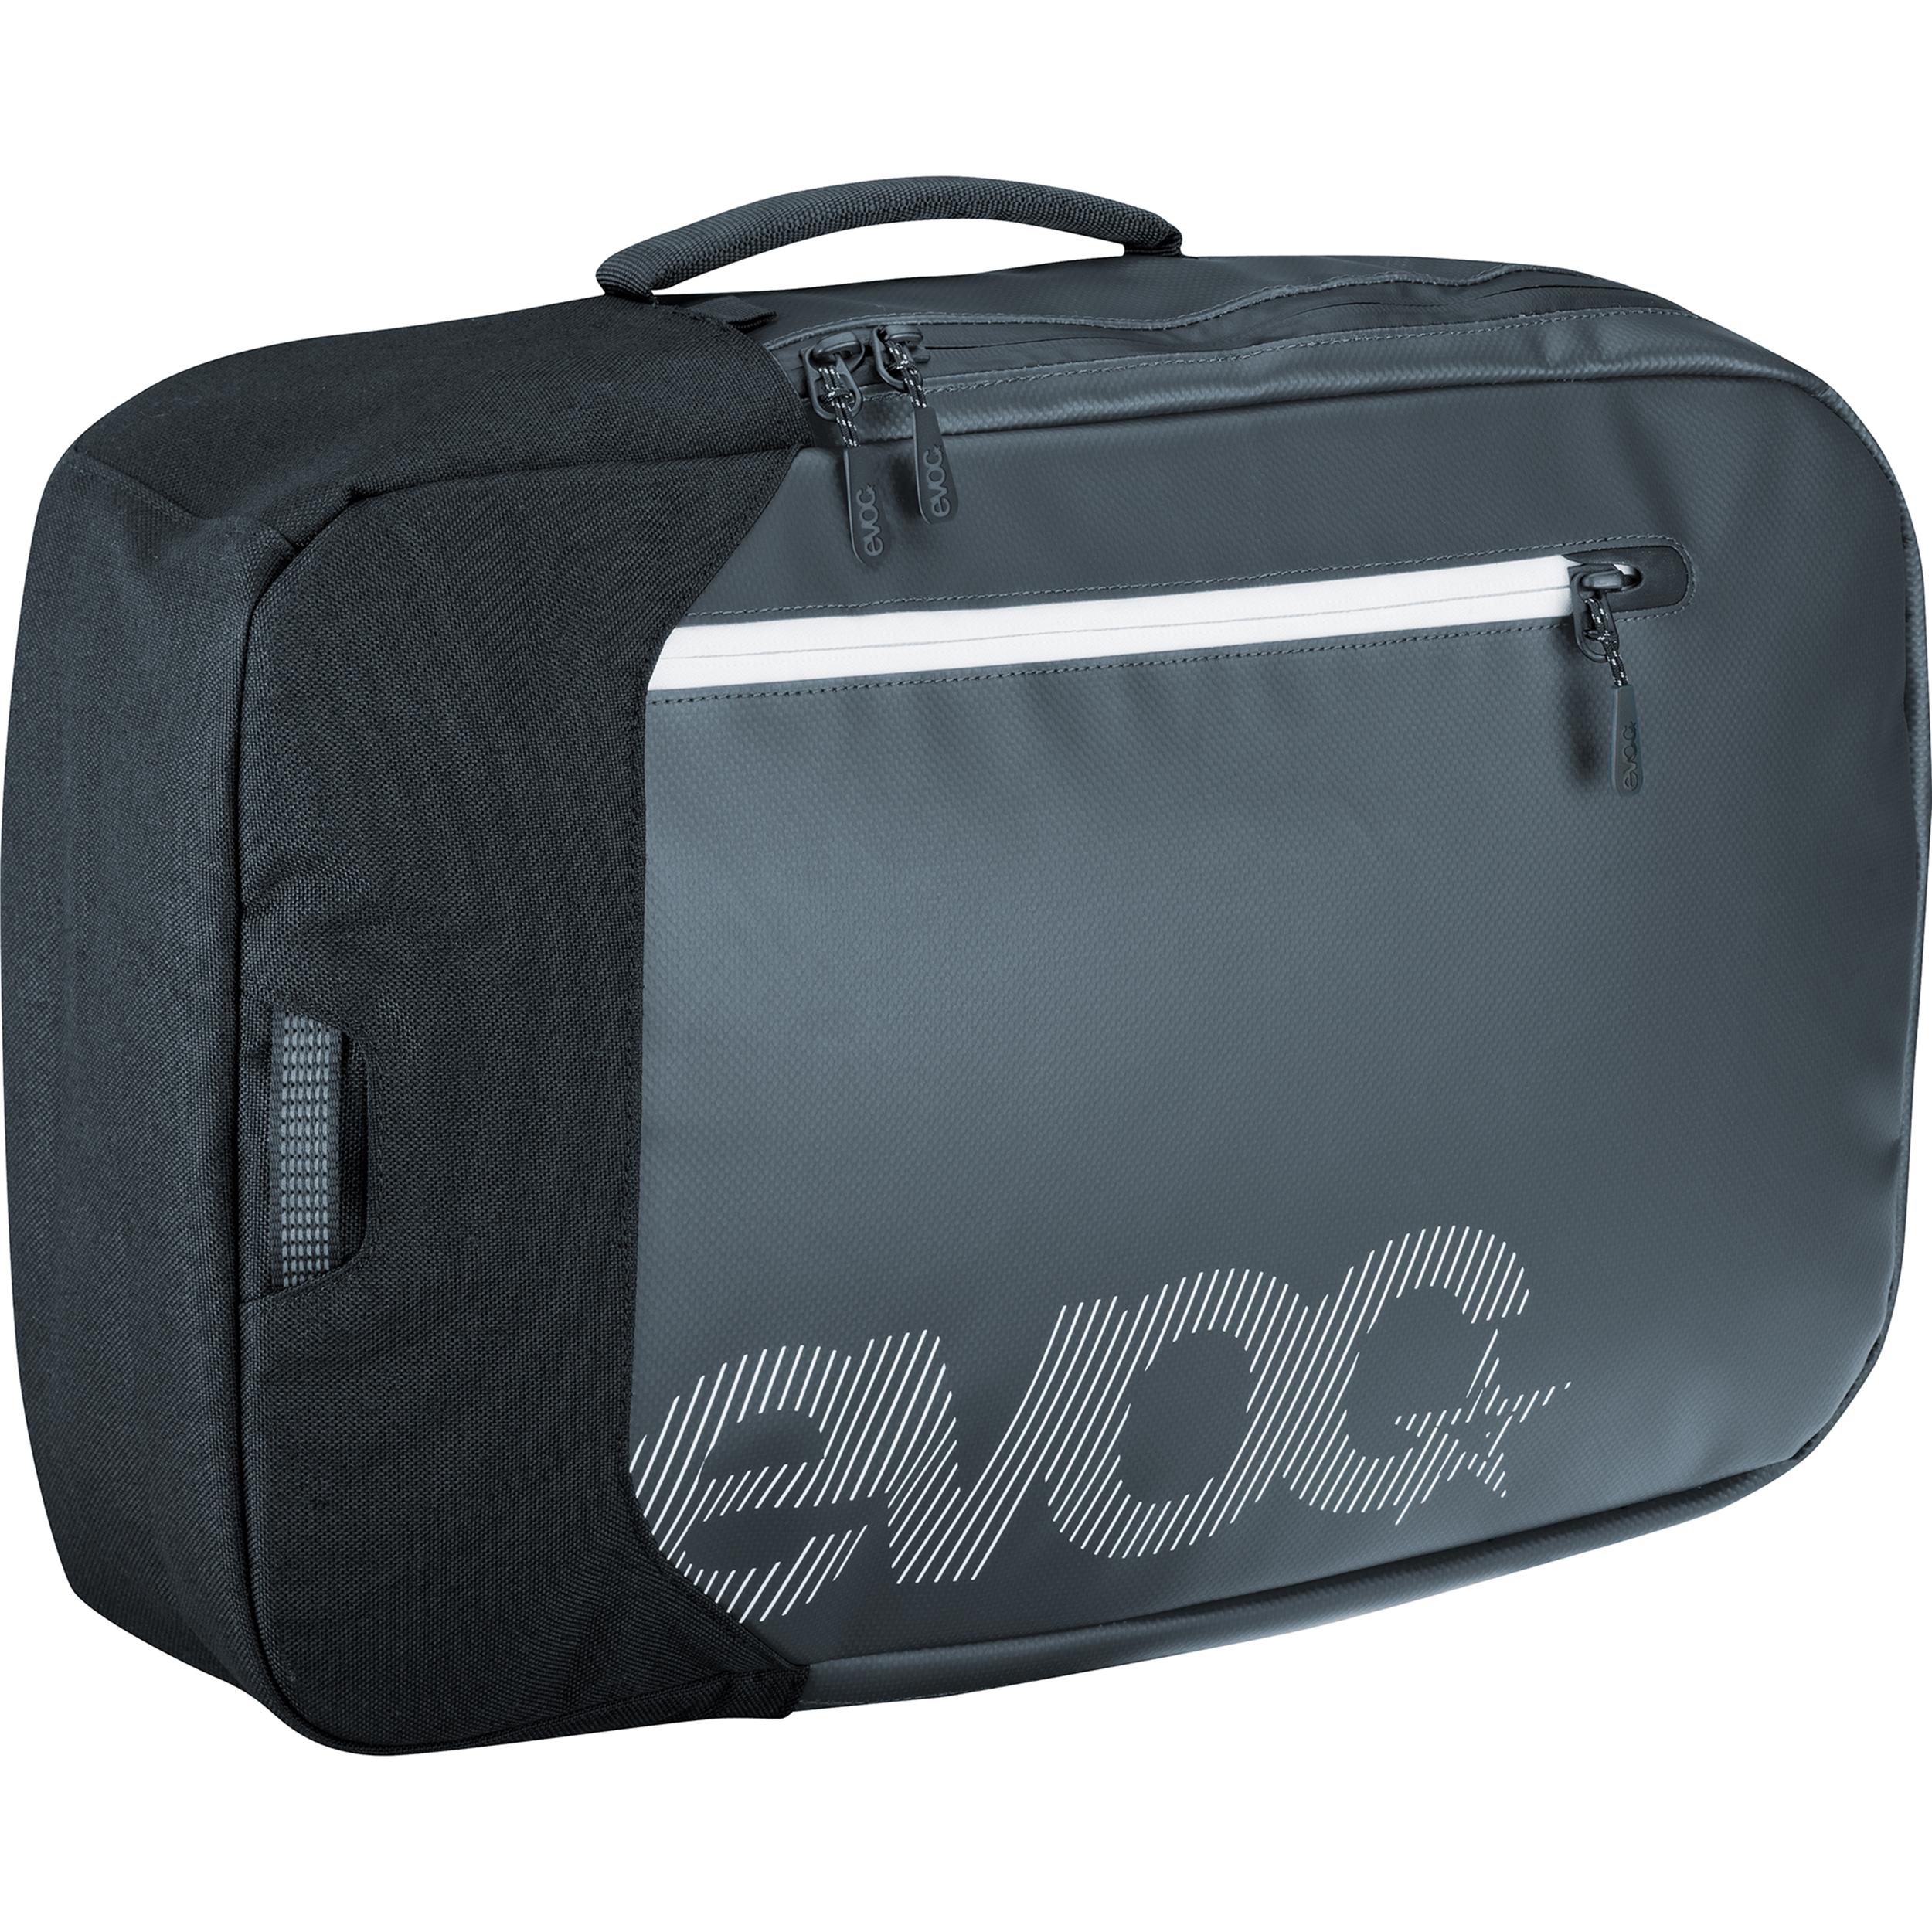 EVOC Commuter 18L Backpack - Unisex 0064e4ea4d5f2